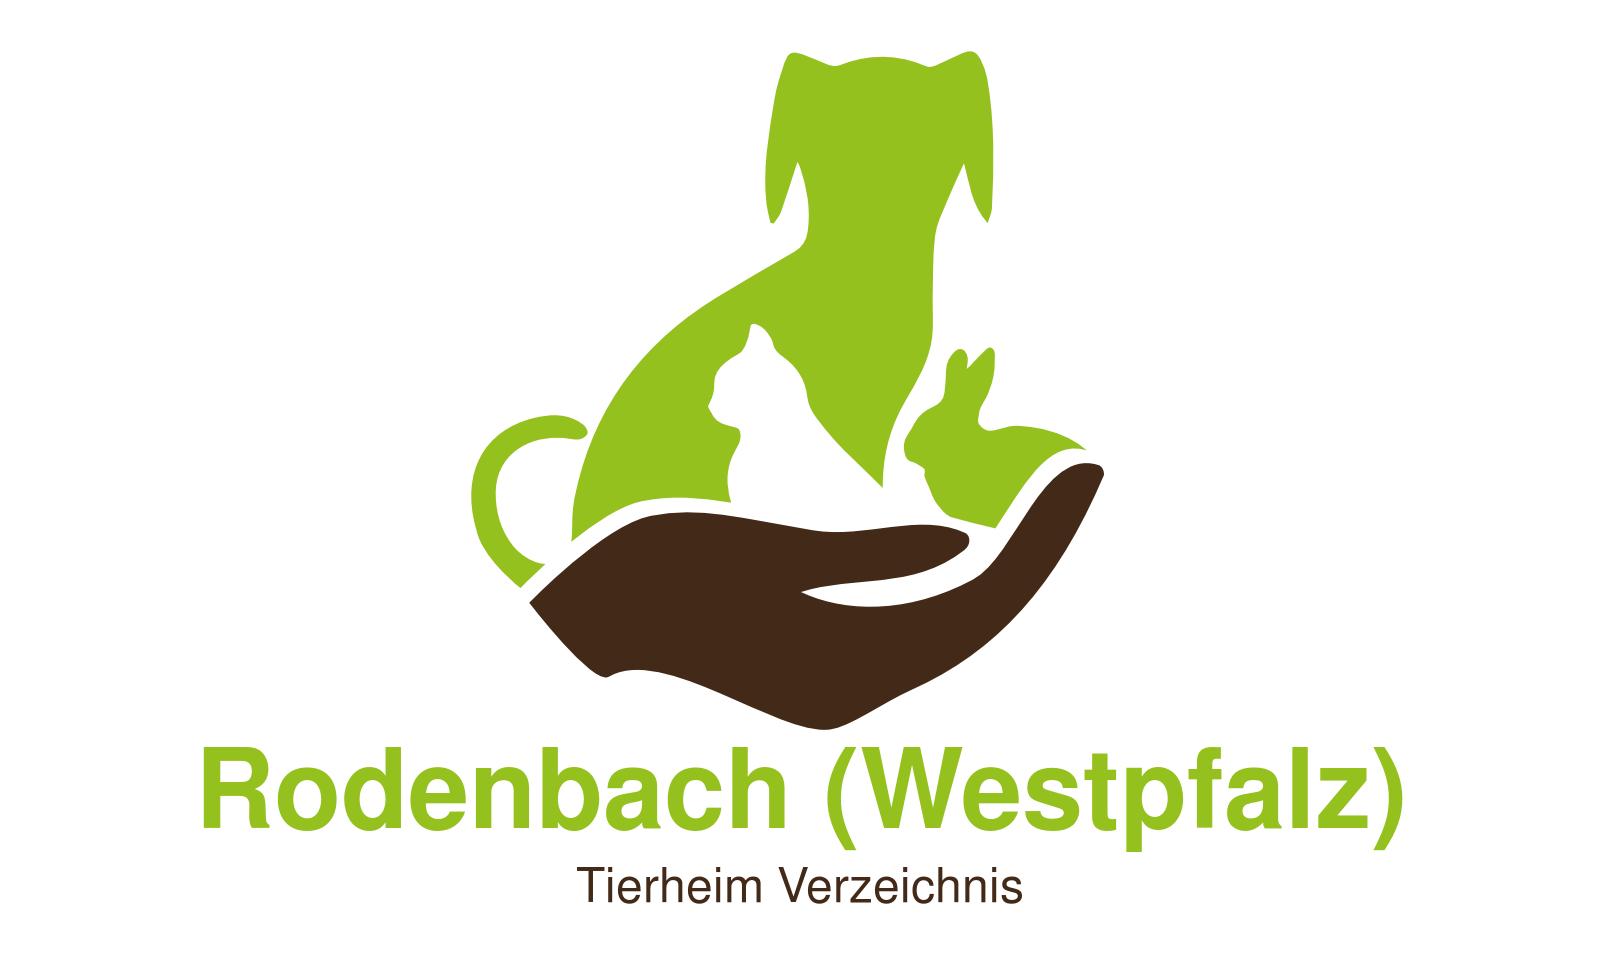 Tierheim Rodenbach (Westpfalz)